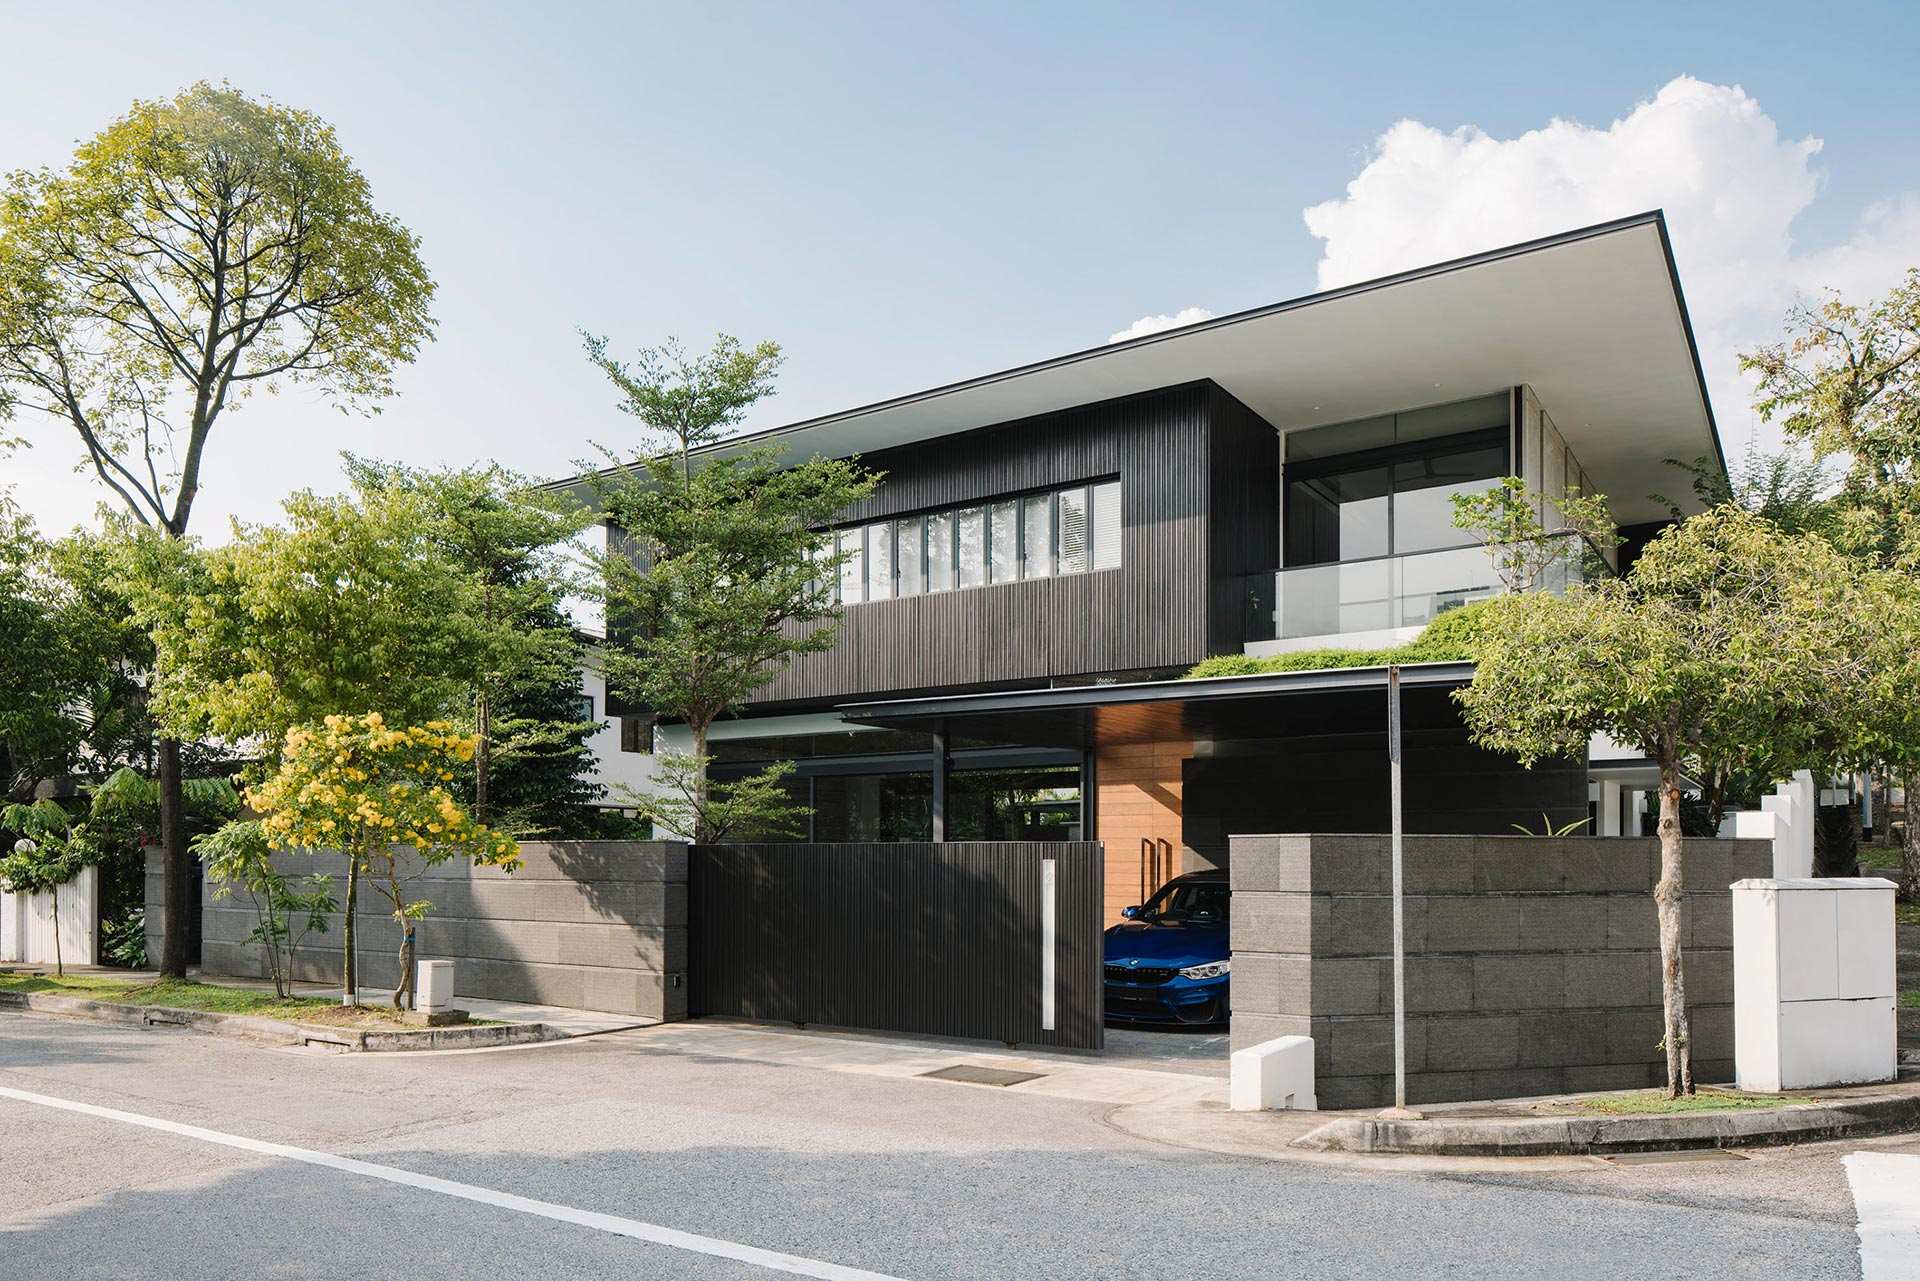 Rem house